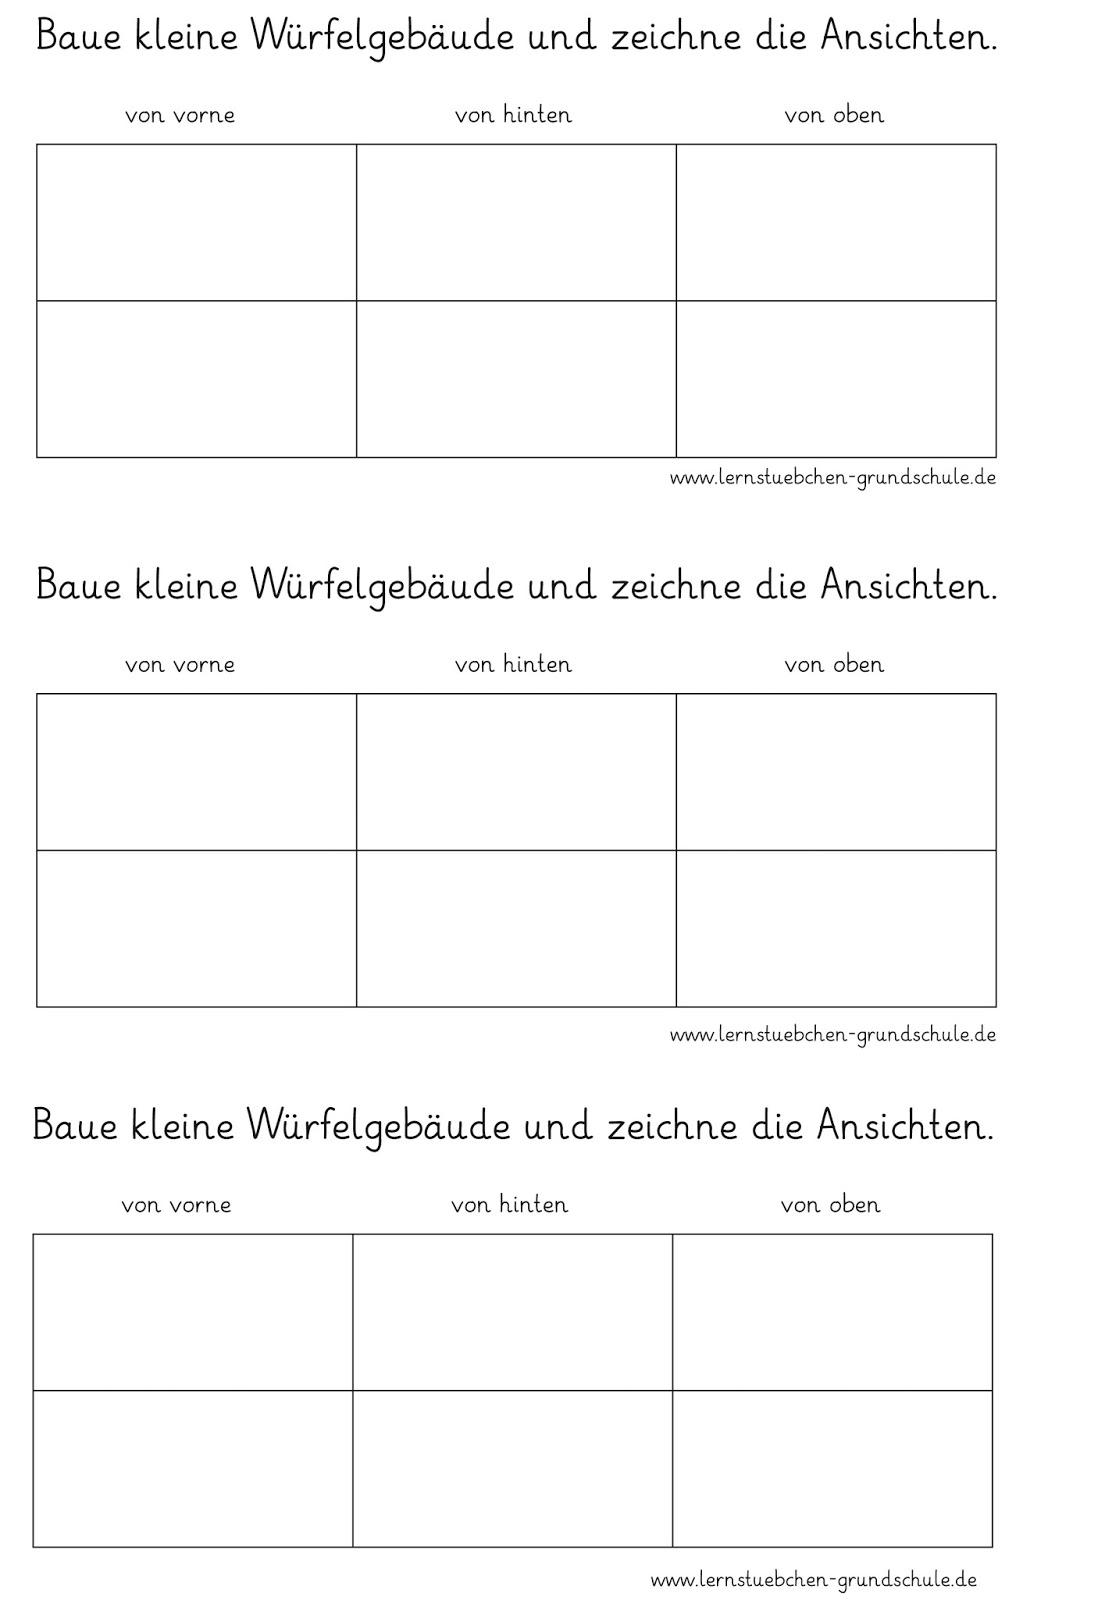 Großartig Lewis Struktur Und VSEPRArbeitsblatt Bilder - Arbeitsblatt ...